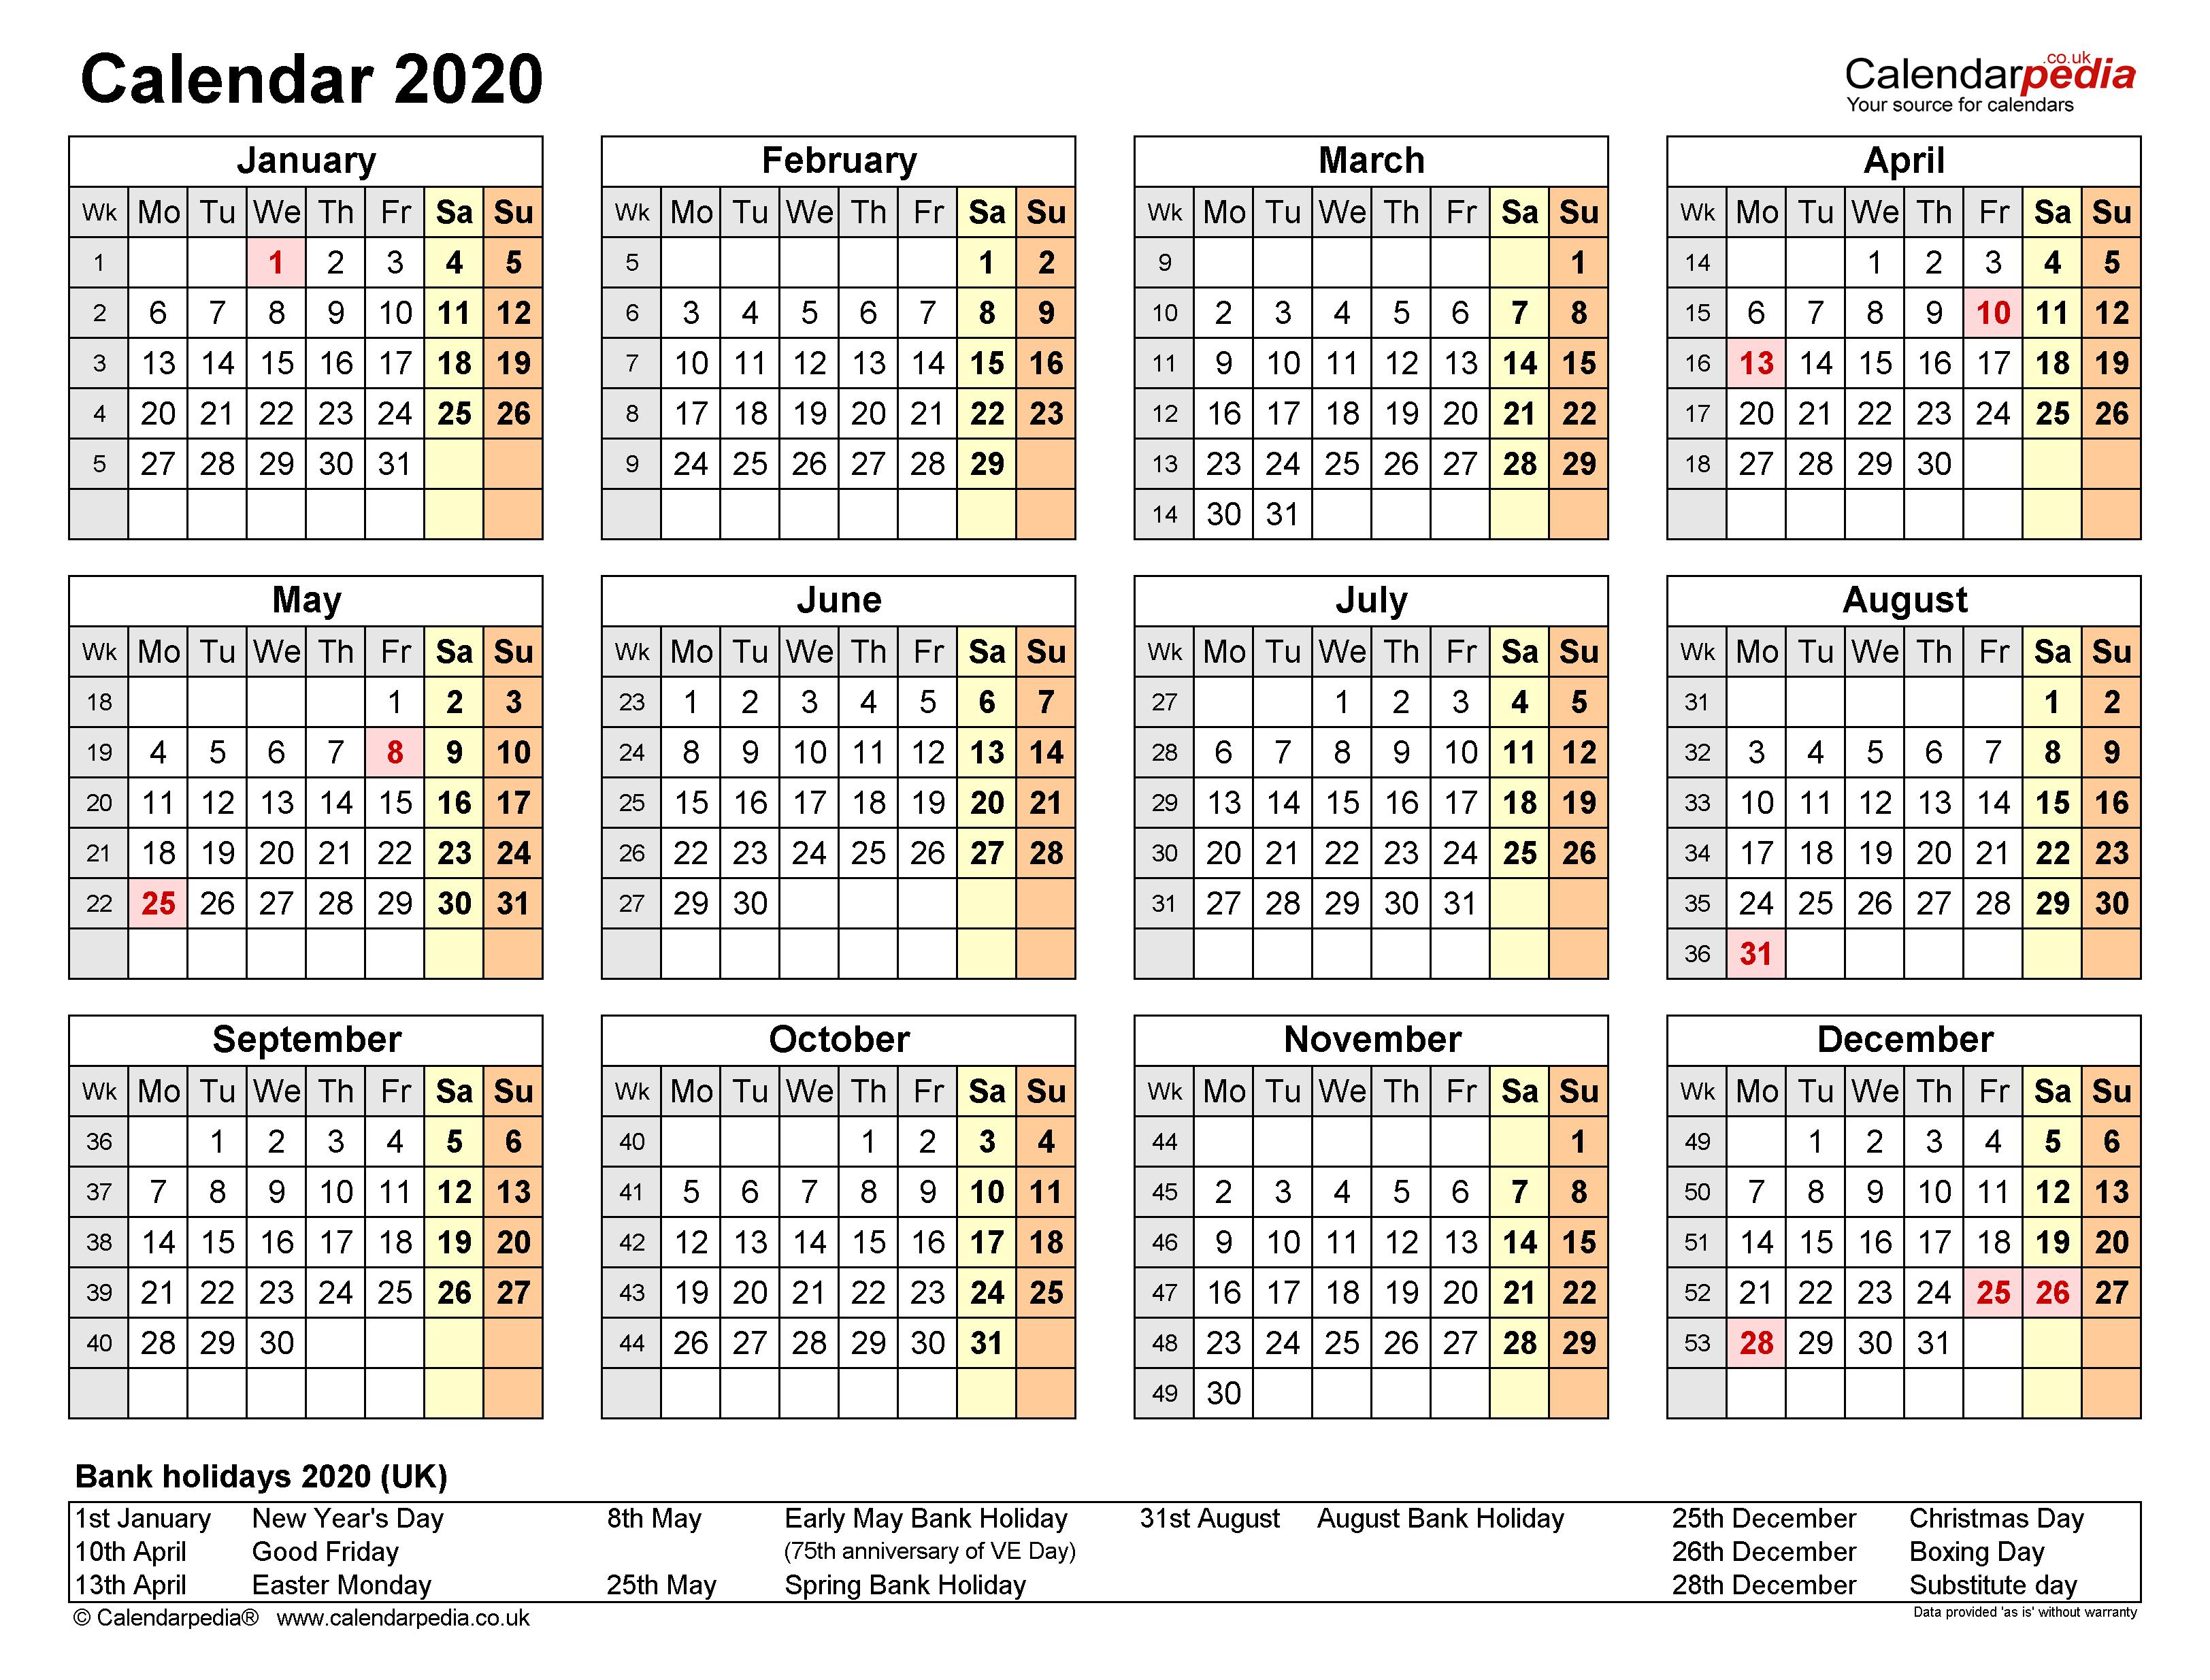 Excel Calendar 2020 (Uk) | 17 Printable Templates (Xlsx, Free) Throughout Editable 2021 Elf Calendar